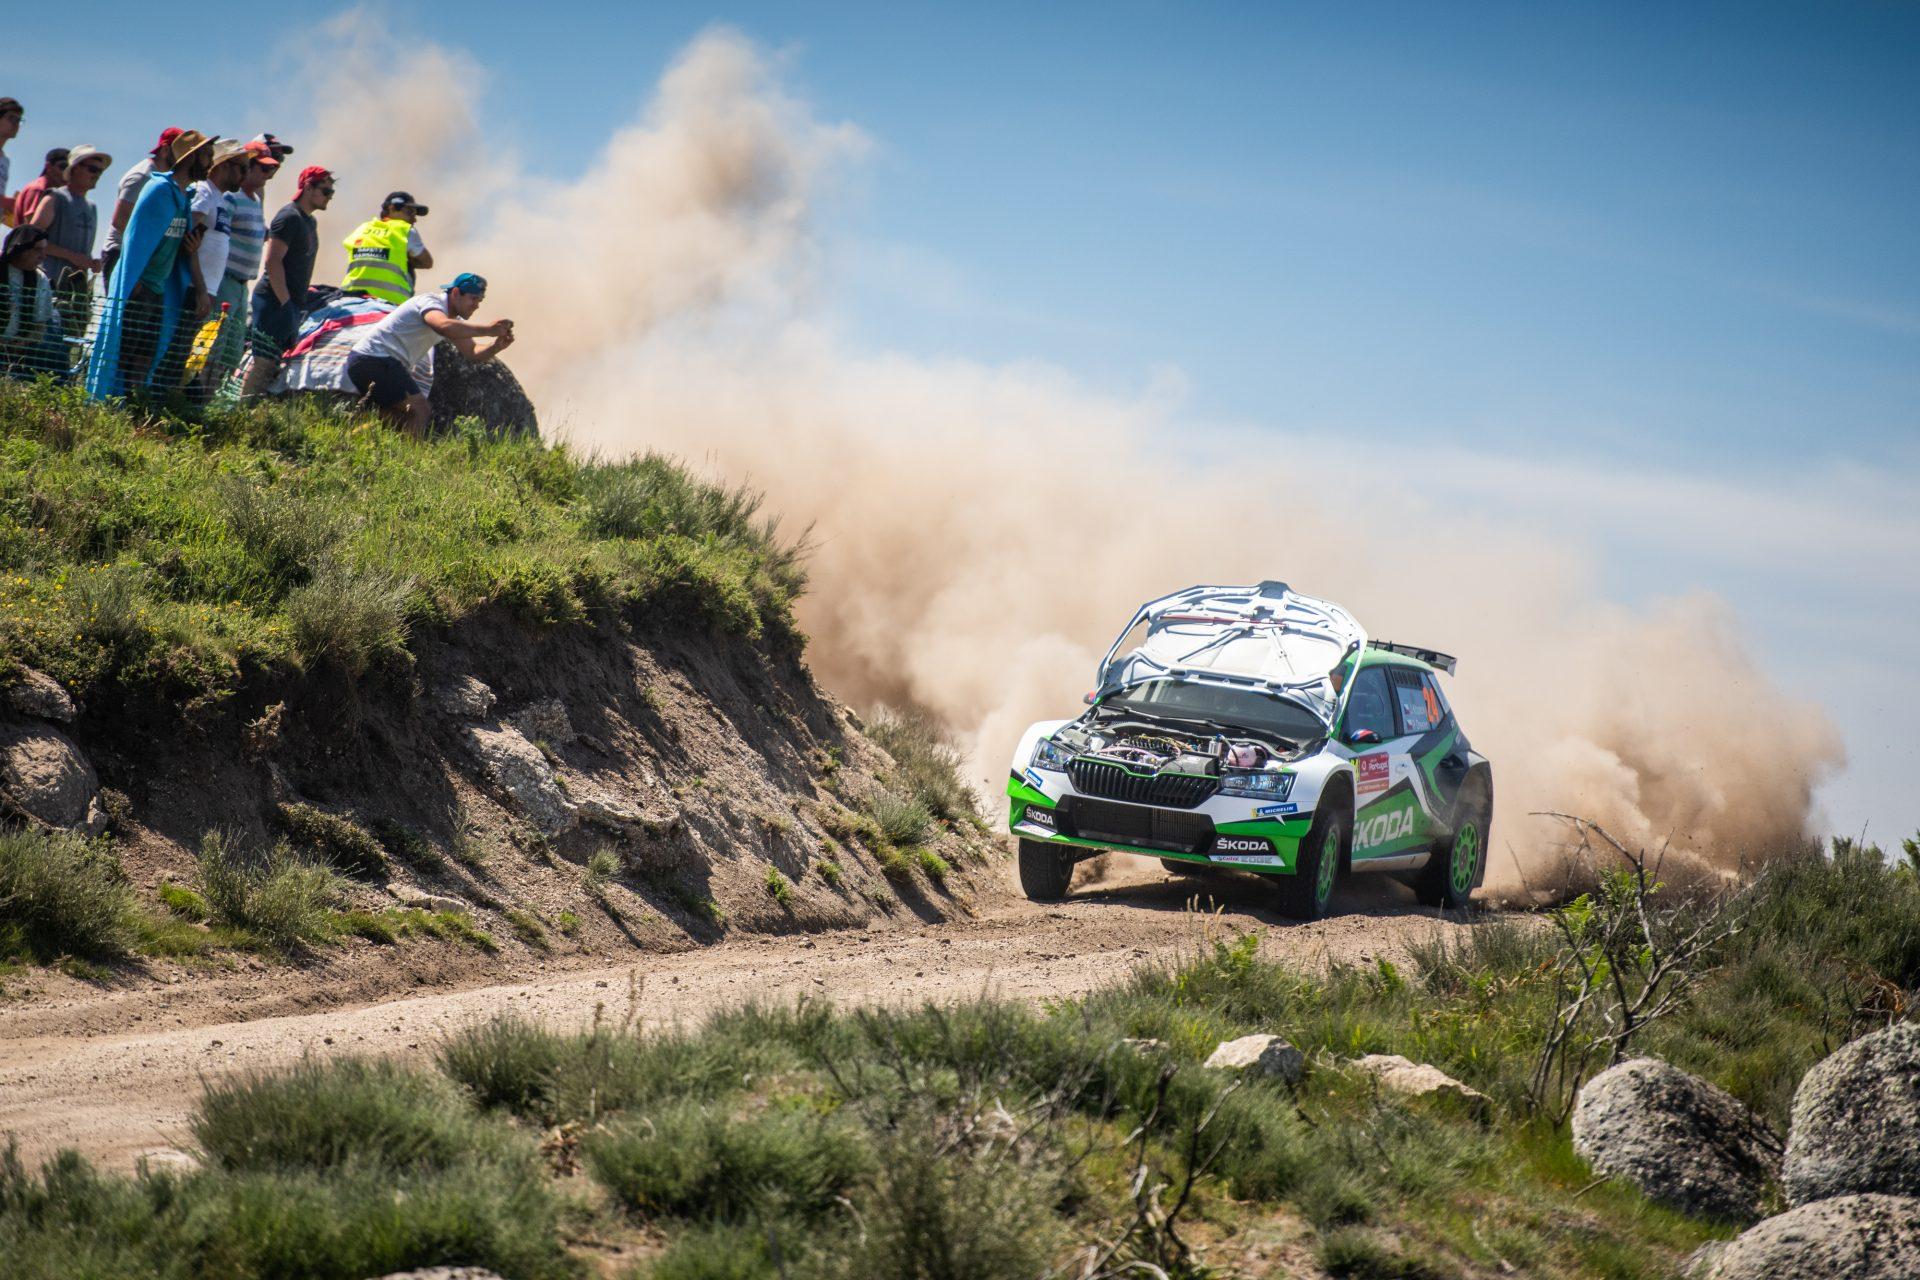 Rally de Portugal 2019: Aktuální výsledky a novinky